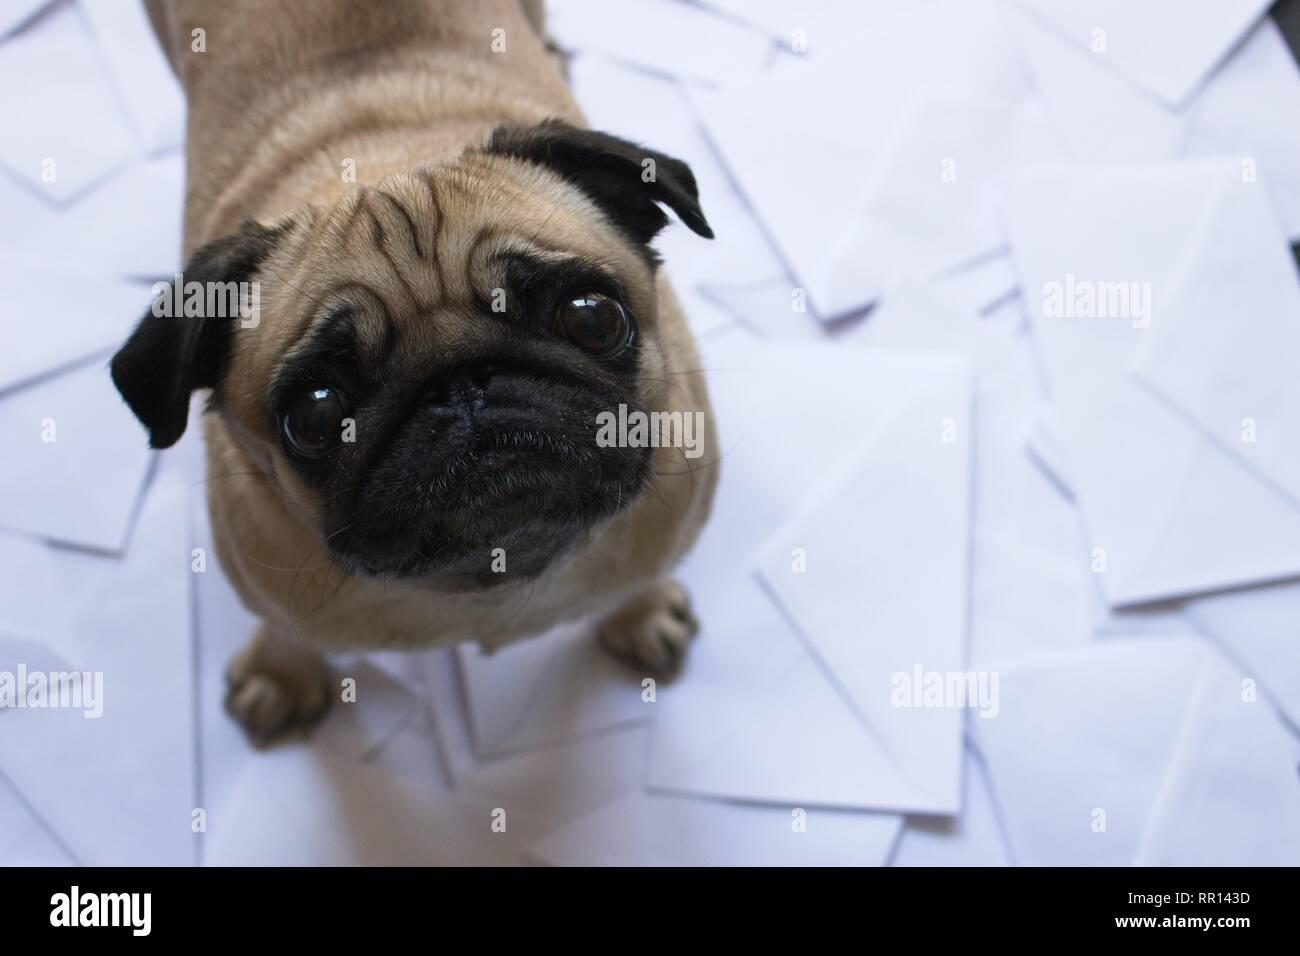 Pug standing on envelopes - Stock Image